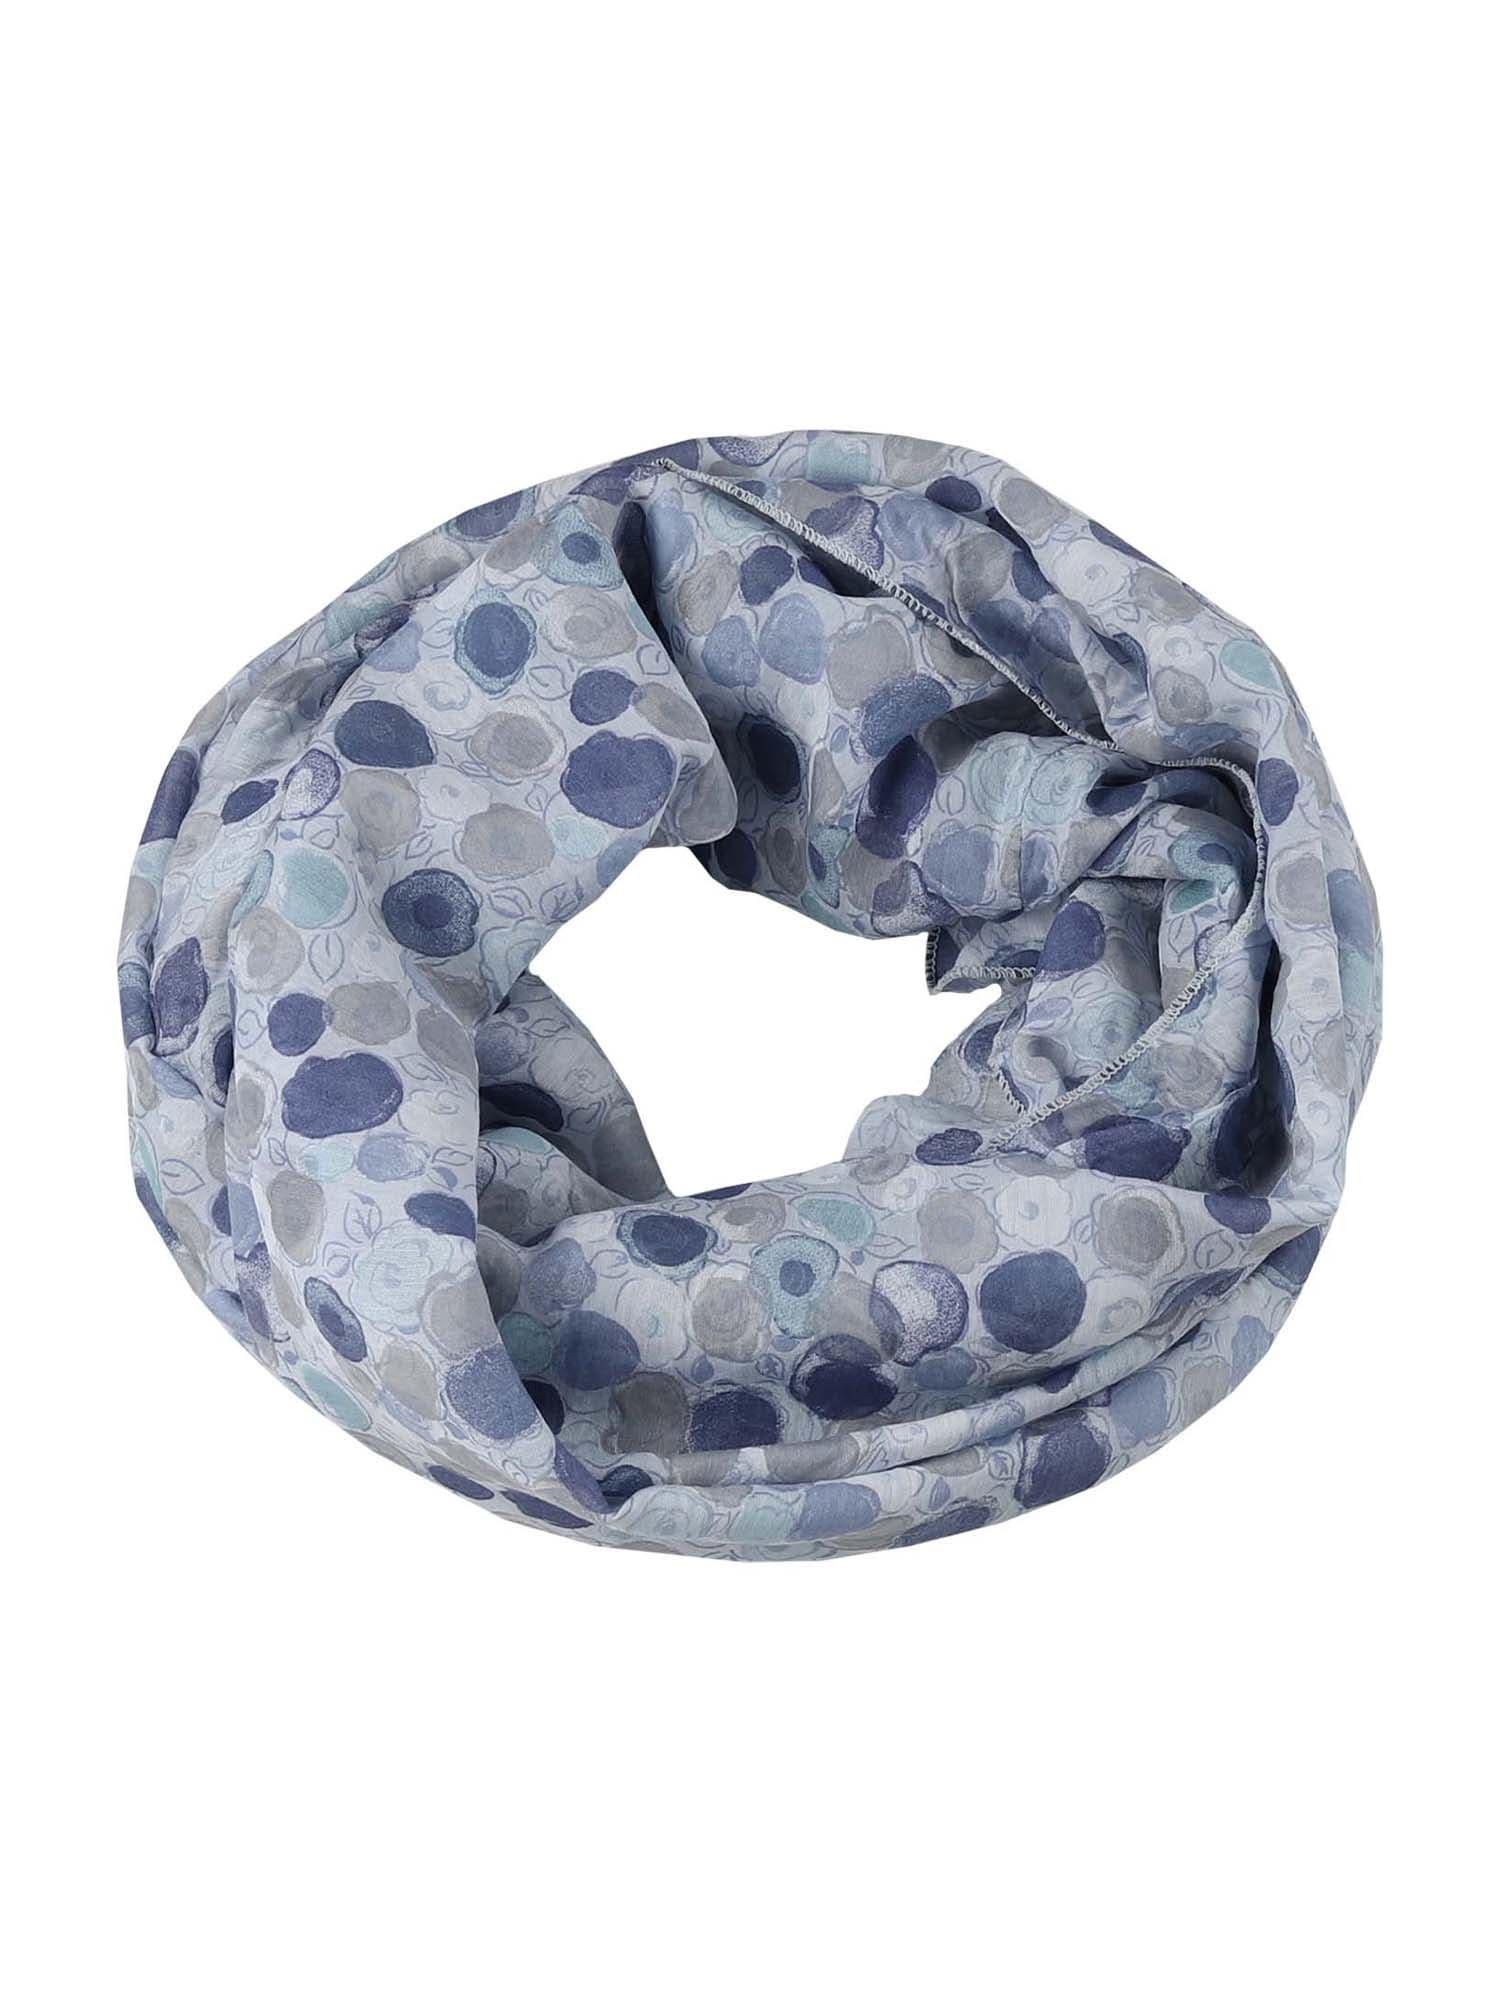 Zwillingsherz Mova mėlyna / balta / smėlio spalva